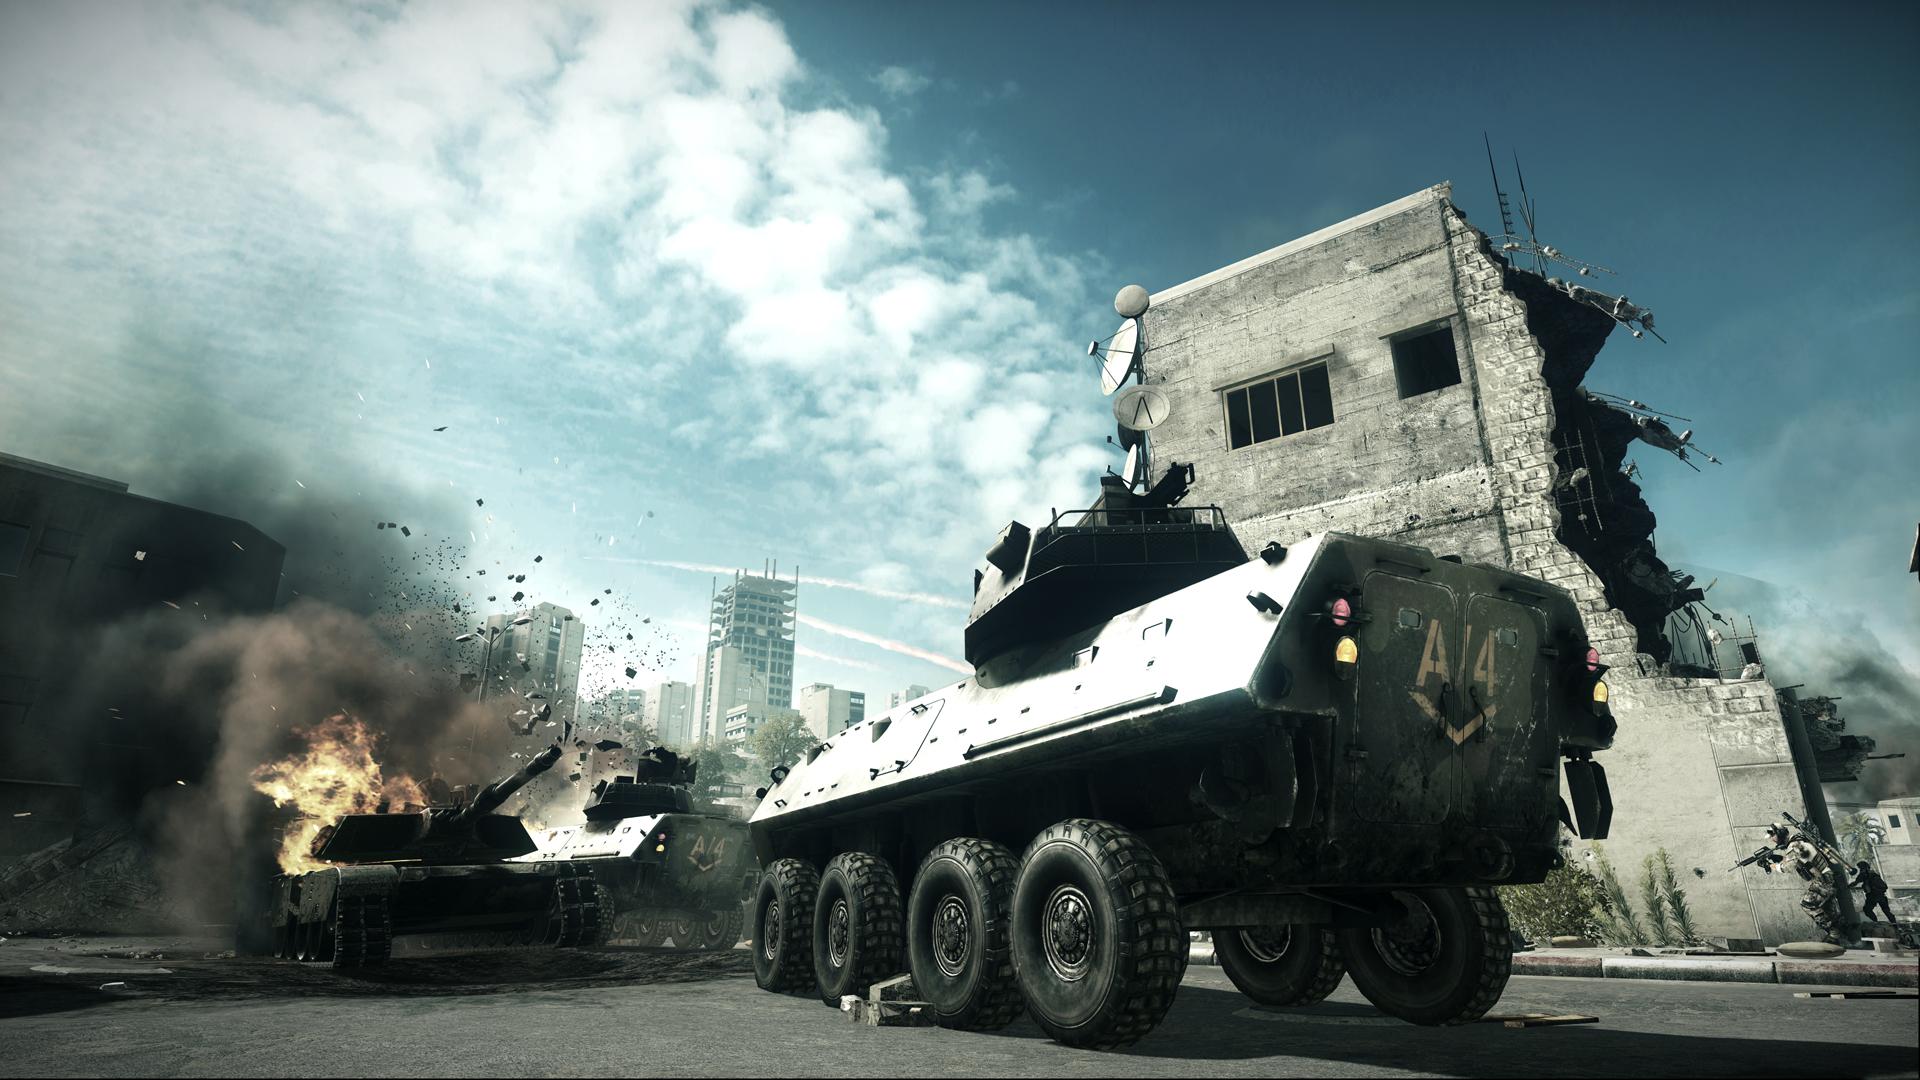 Strike at Karkand (Battlefield 3)